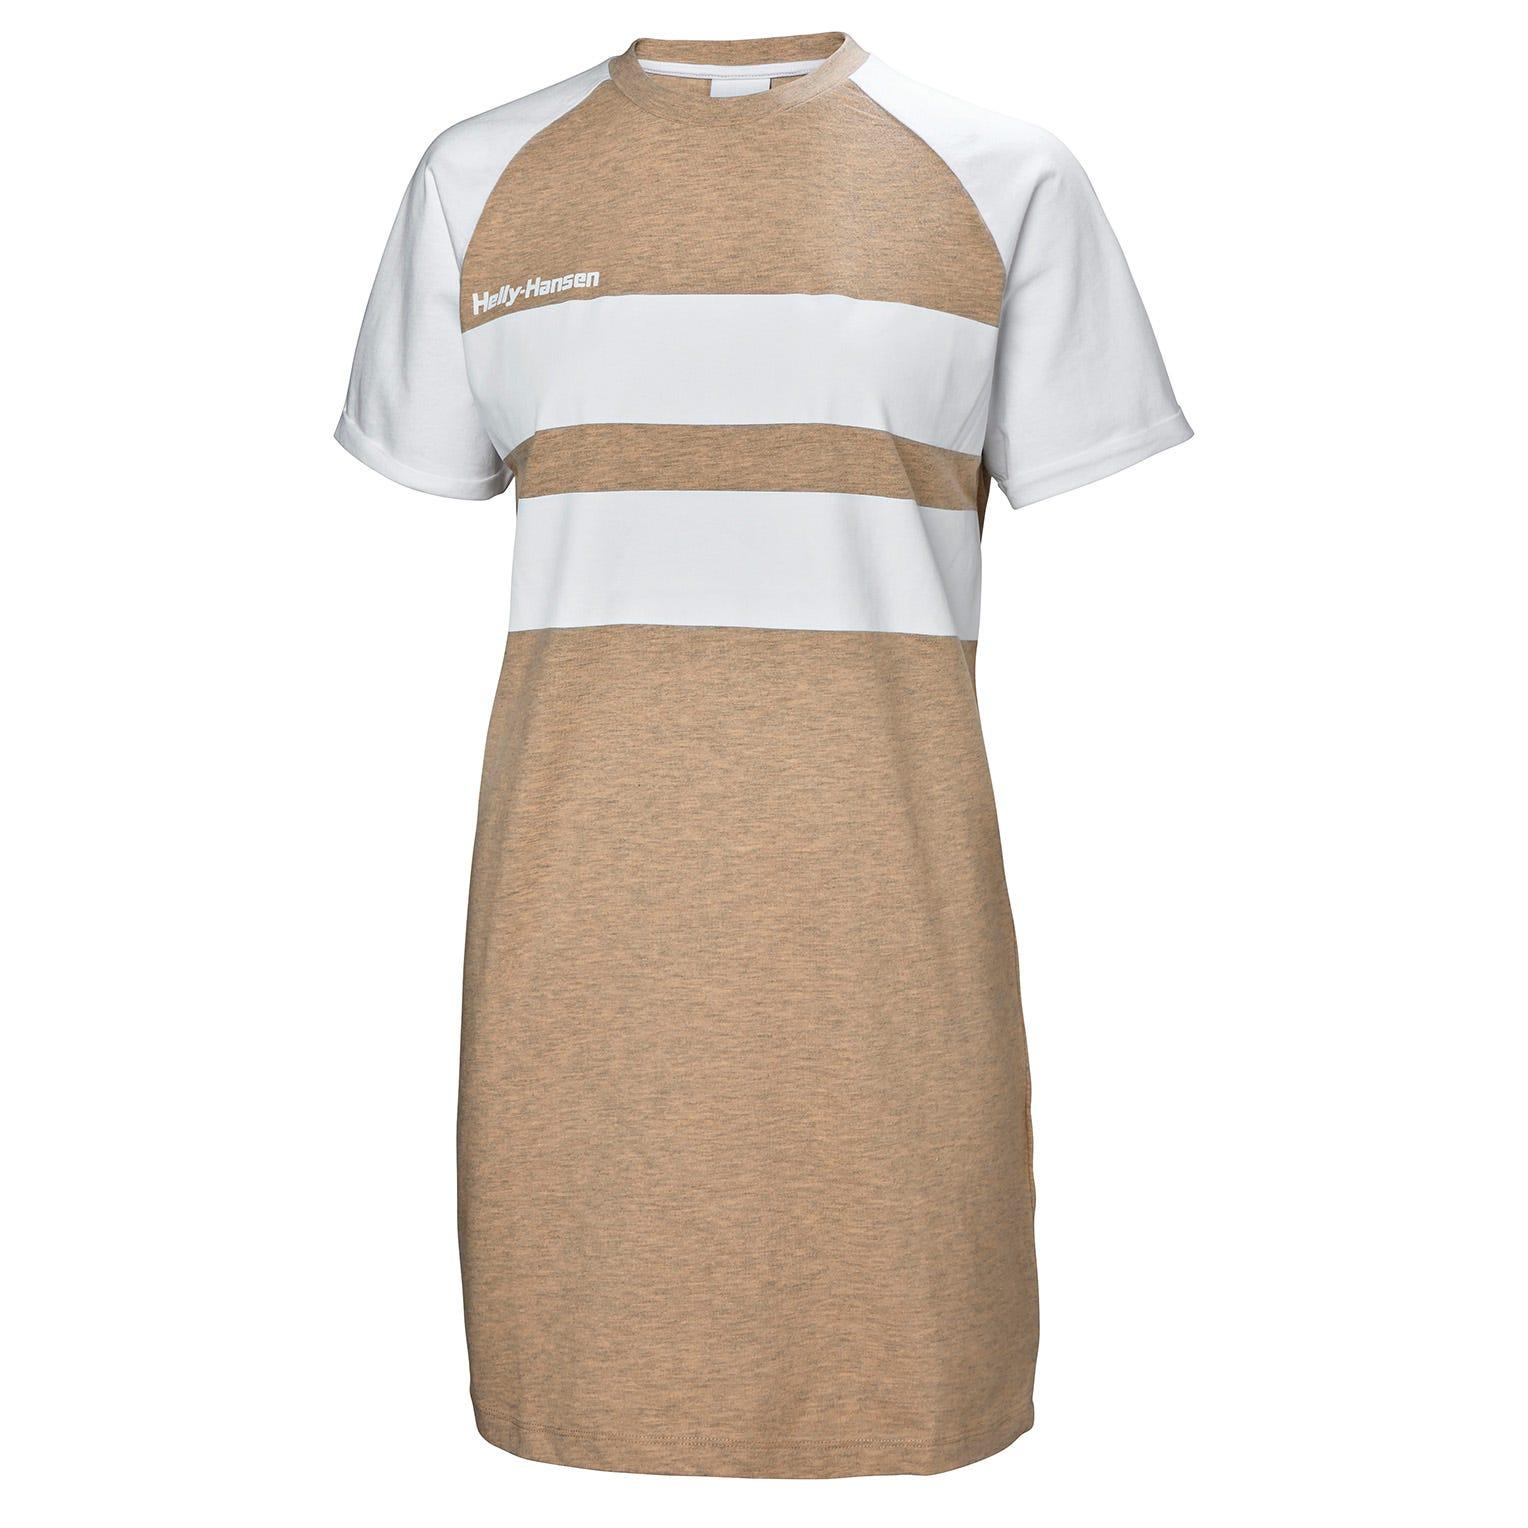 Helly Hansen Heritage Tshirt Dress Womens Rain Jacket Beige XS